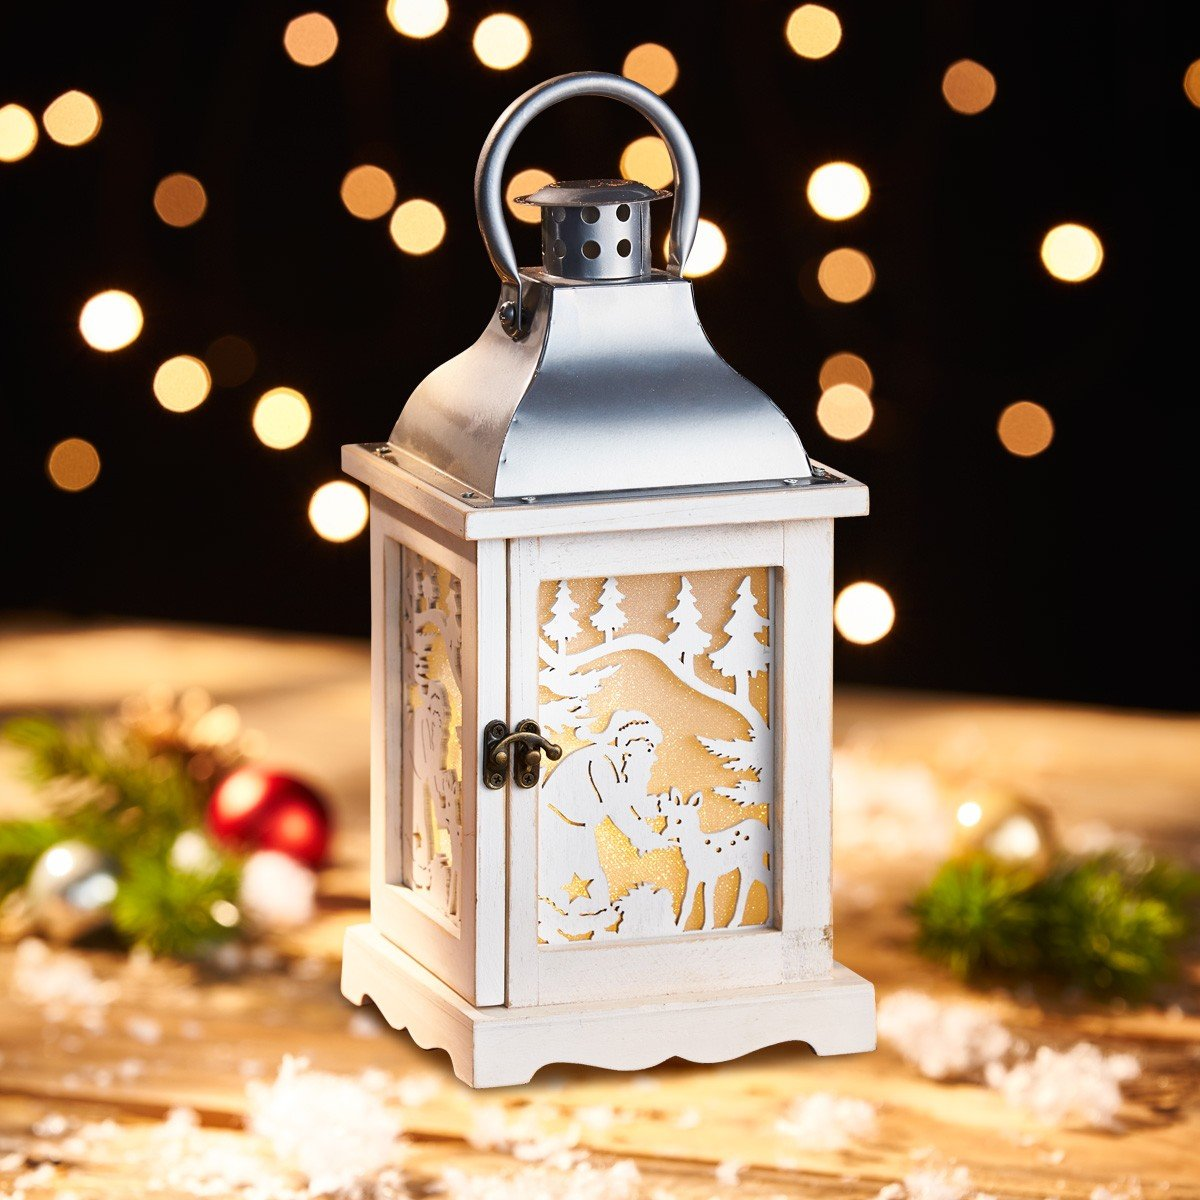 Lantaarn met leds »Glitterende kerst« kopen